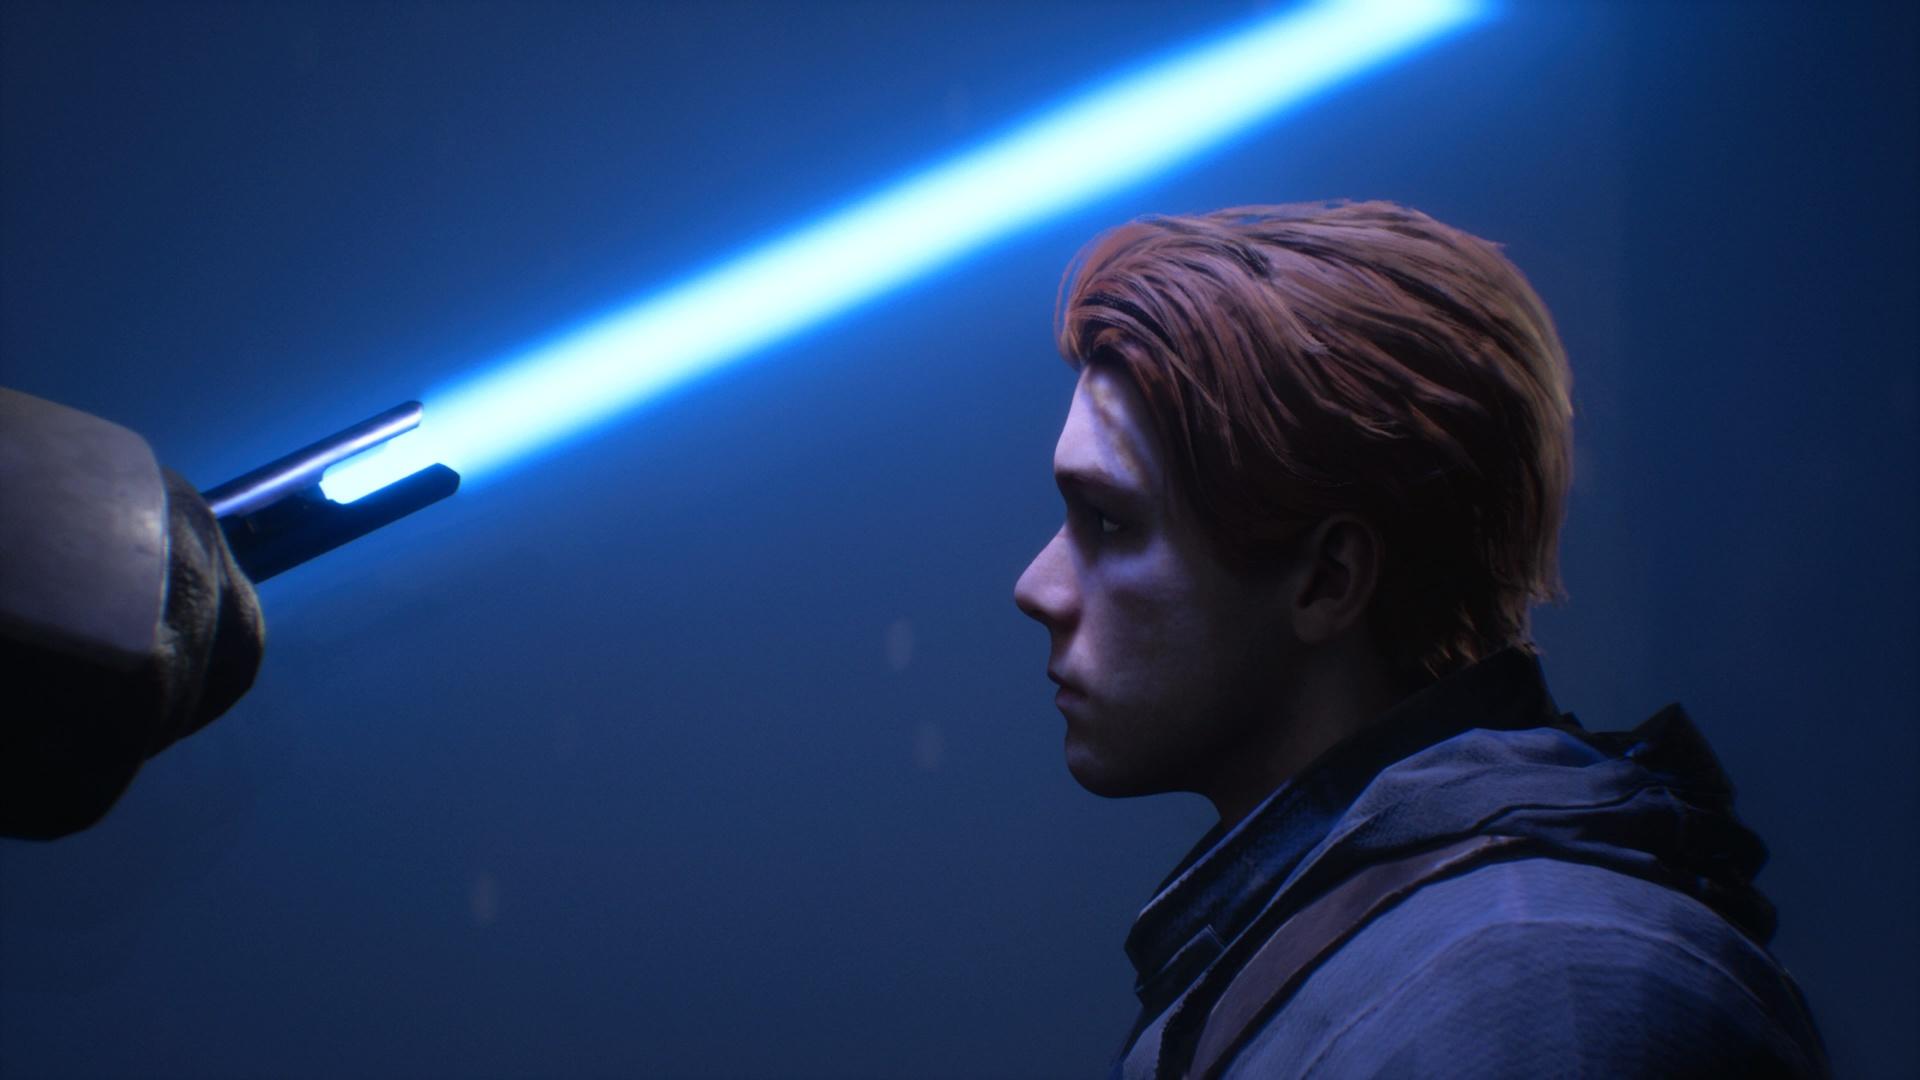 Star Wars Jedi: Fallen Order поставила пару рекордов продаж Electronic Arts